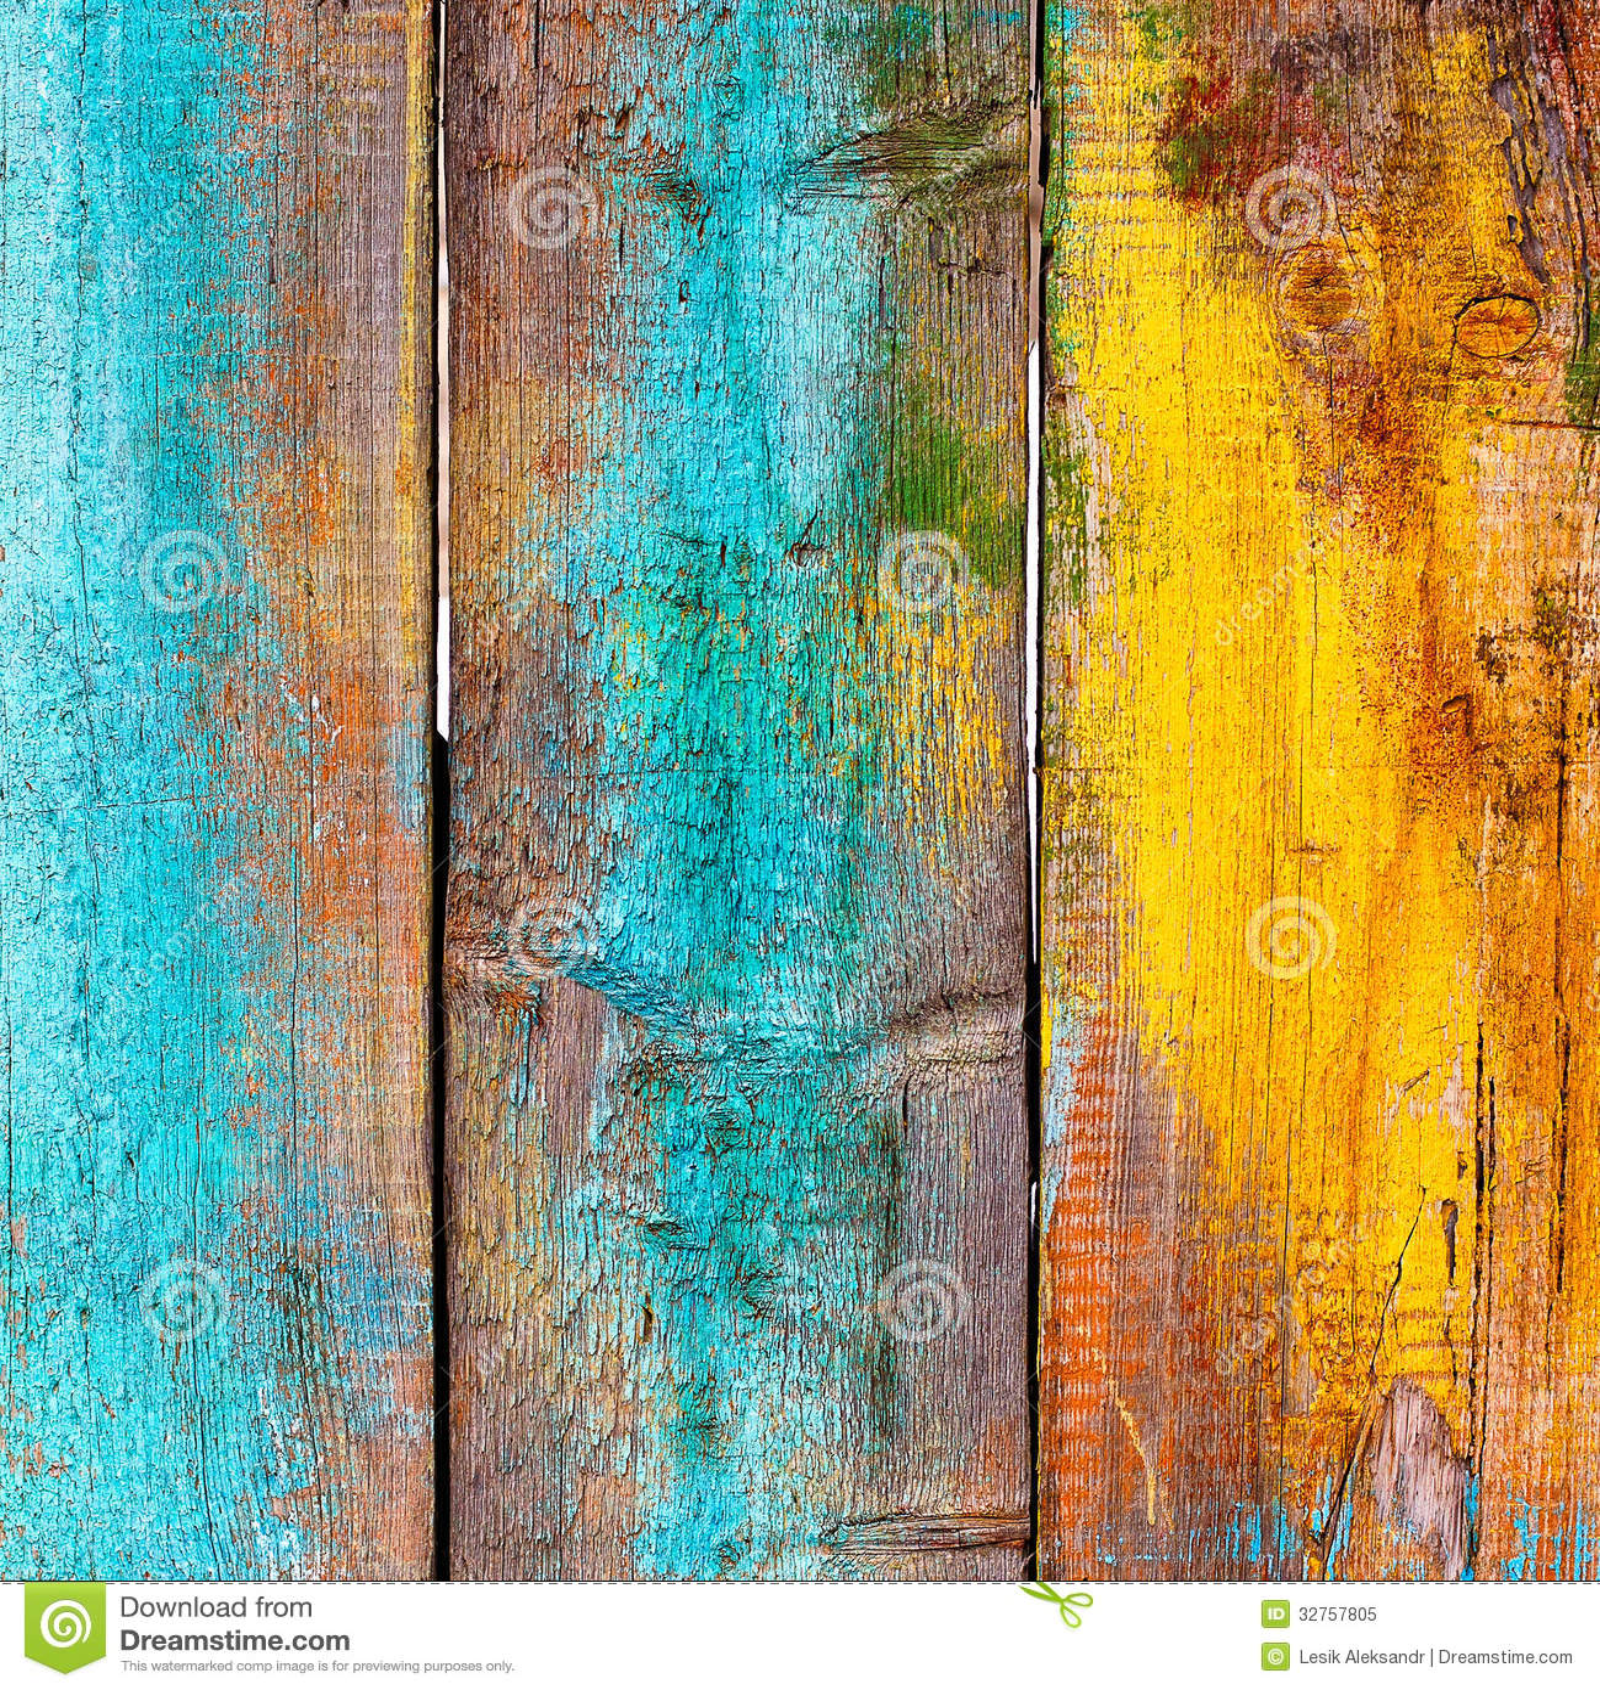 Cerca de madera vieja pintada en diversos colores imagen - Colores de madera ...